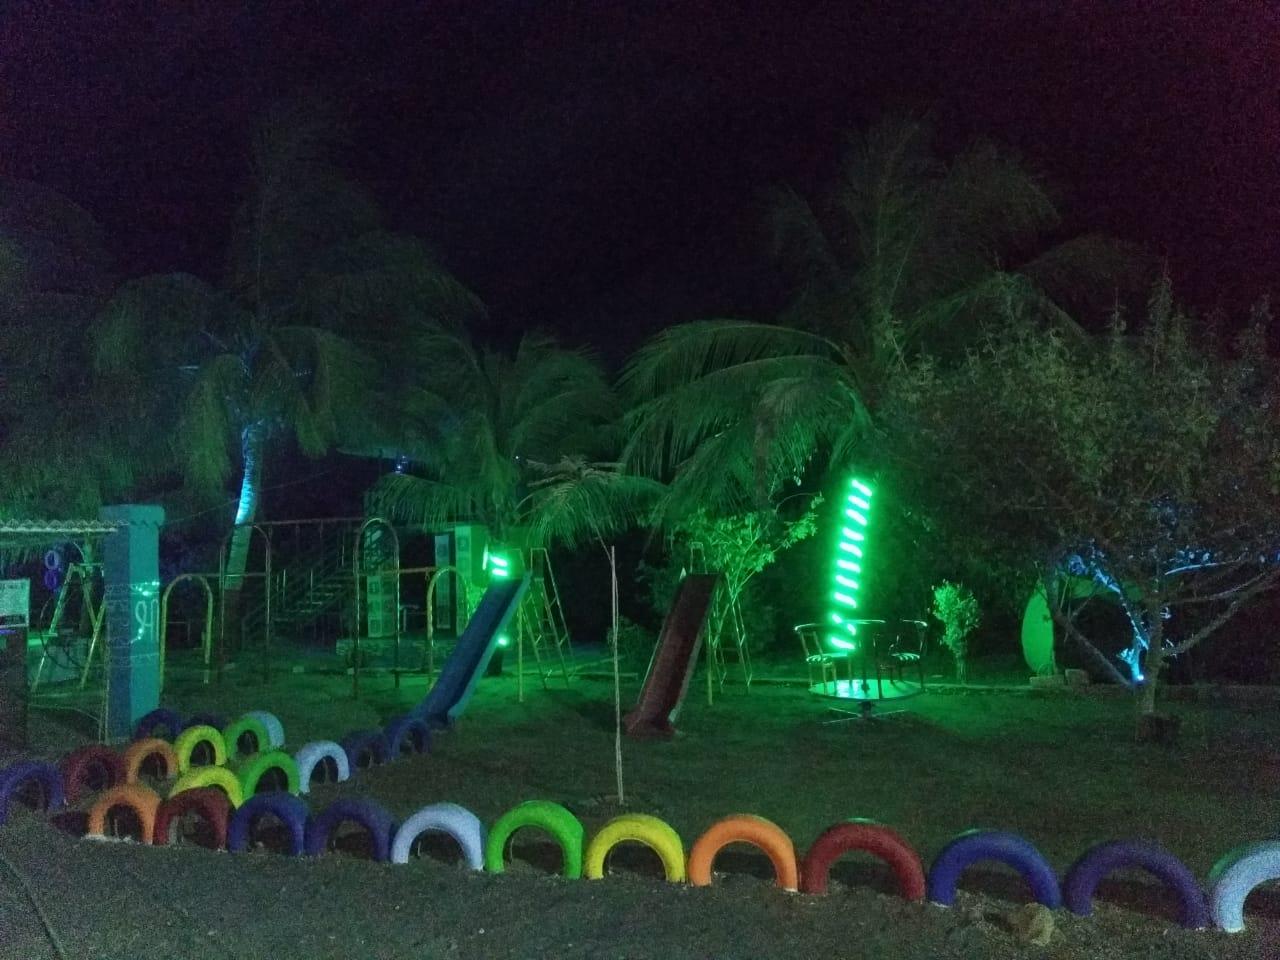 Night view at DNK Organic Farm